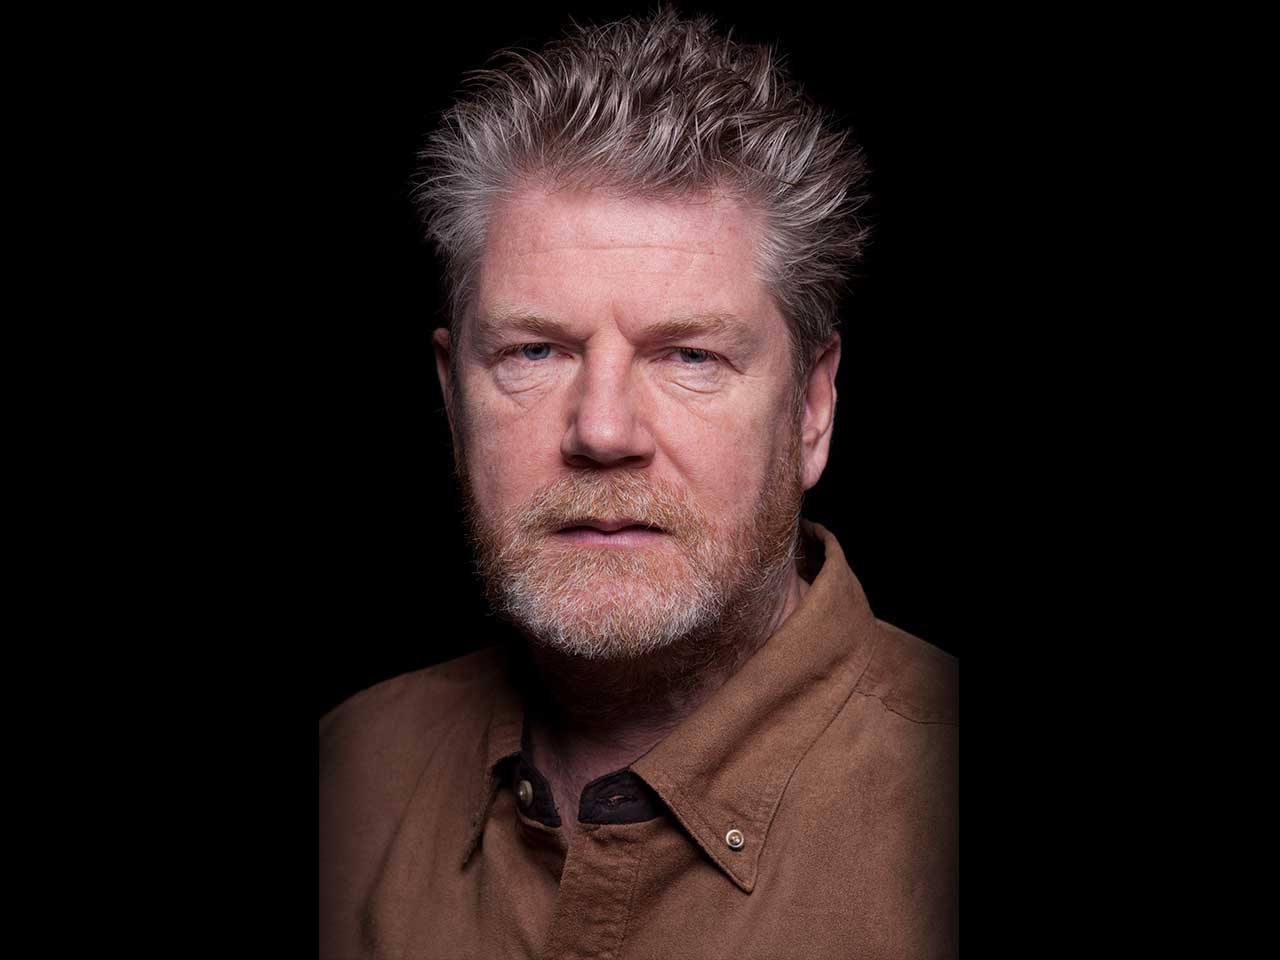 David J. Stewart